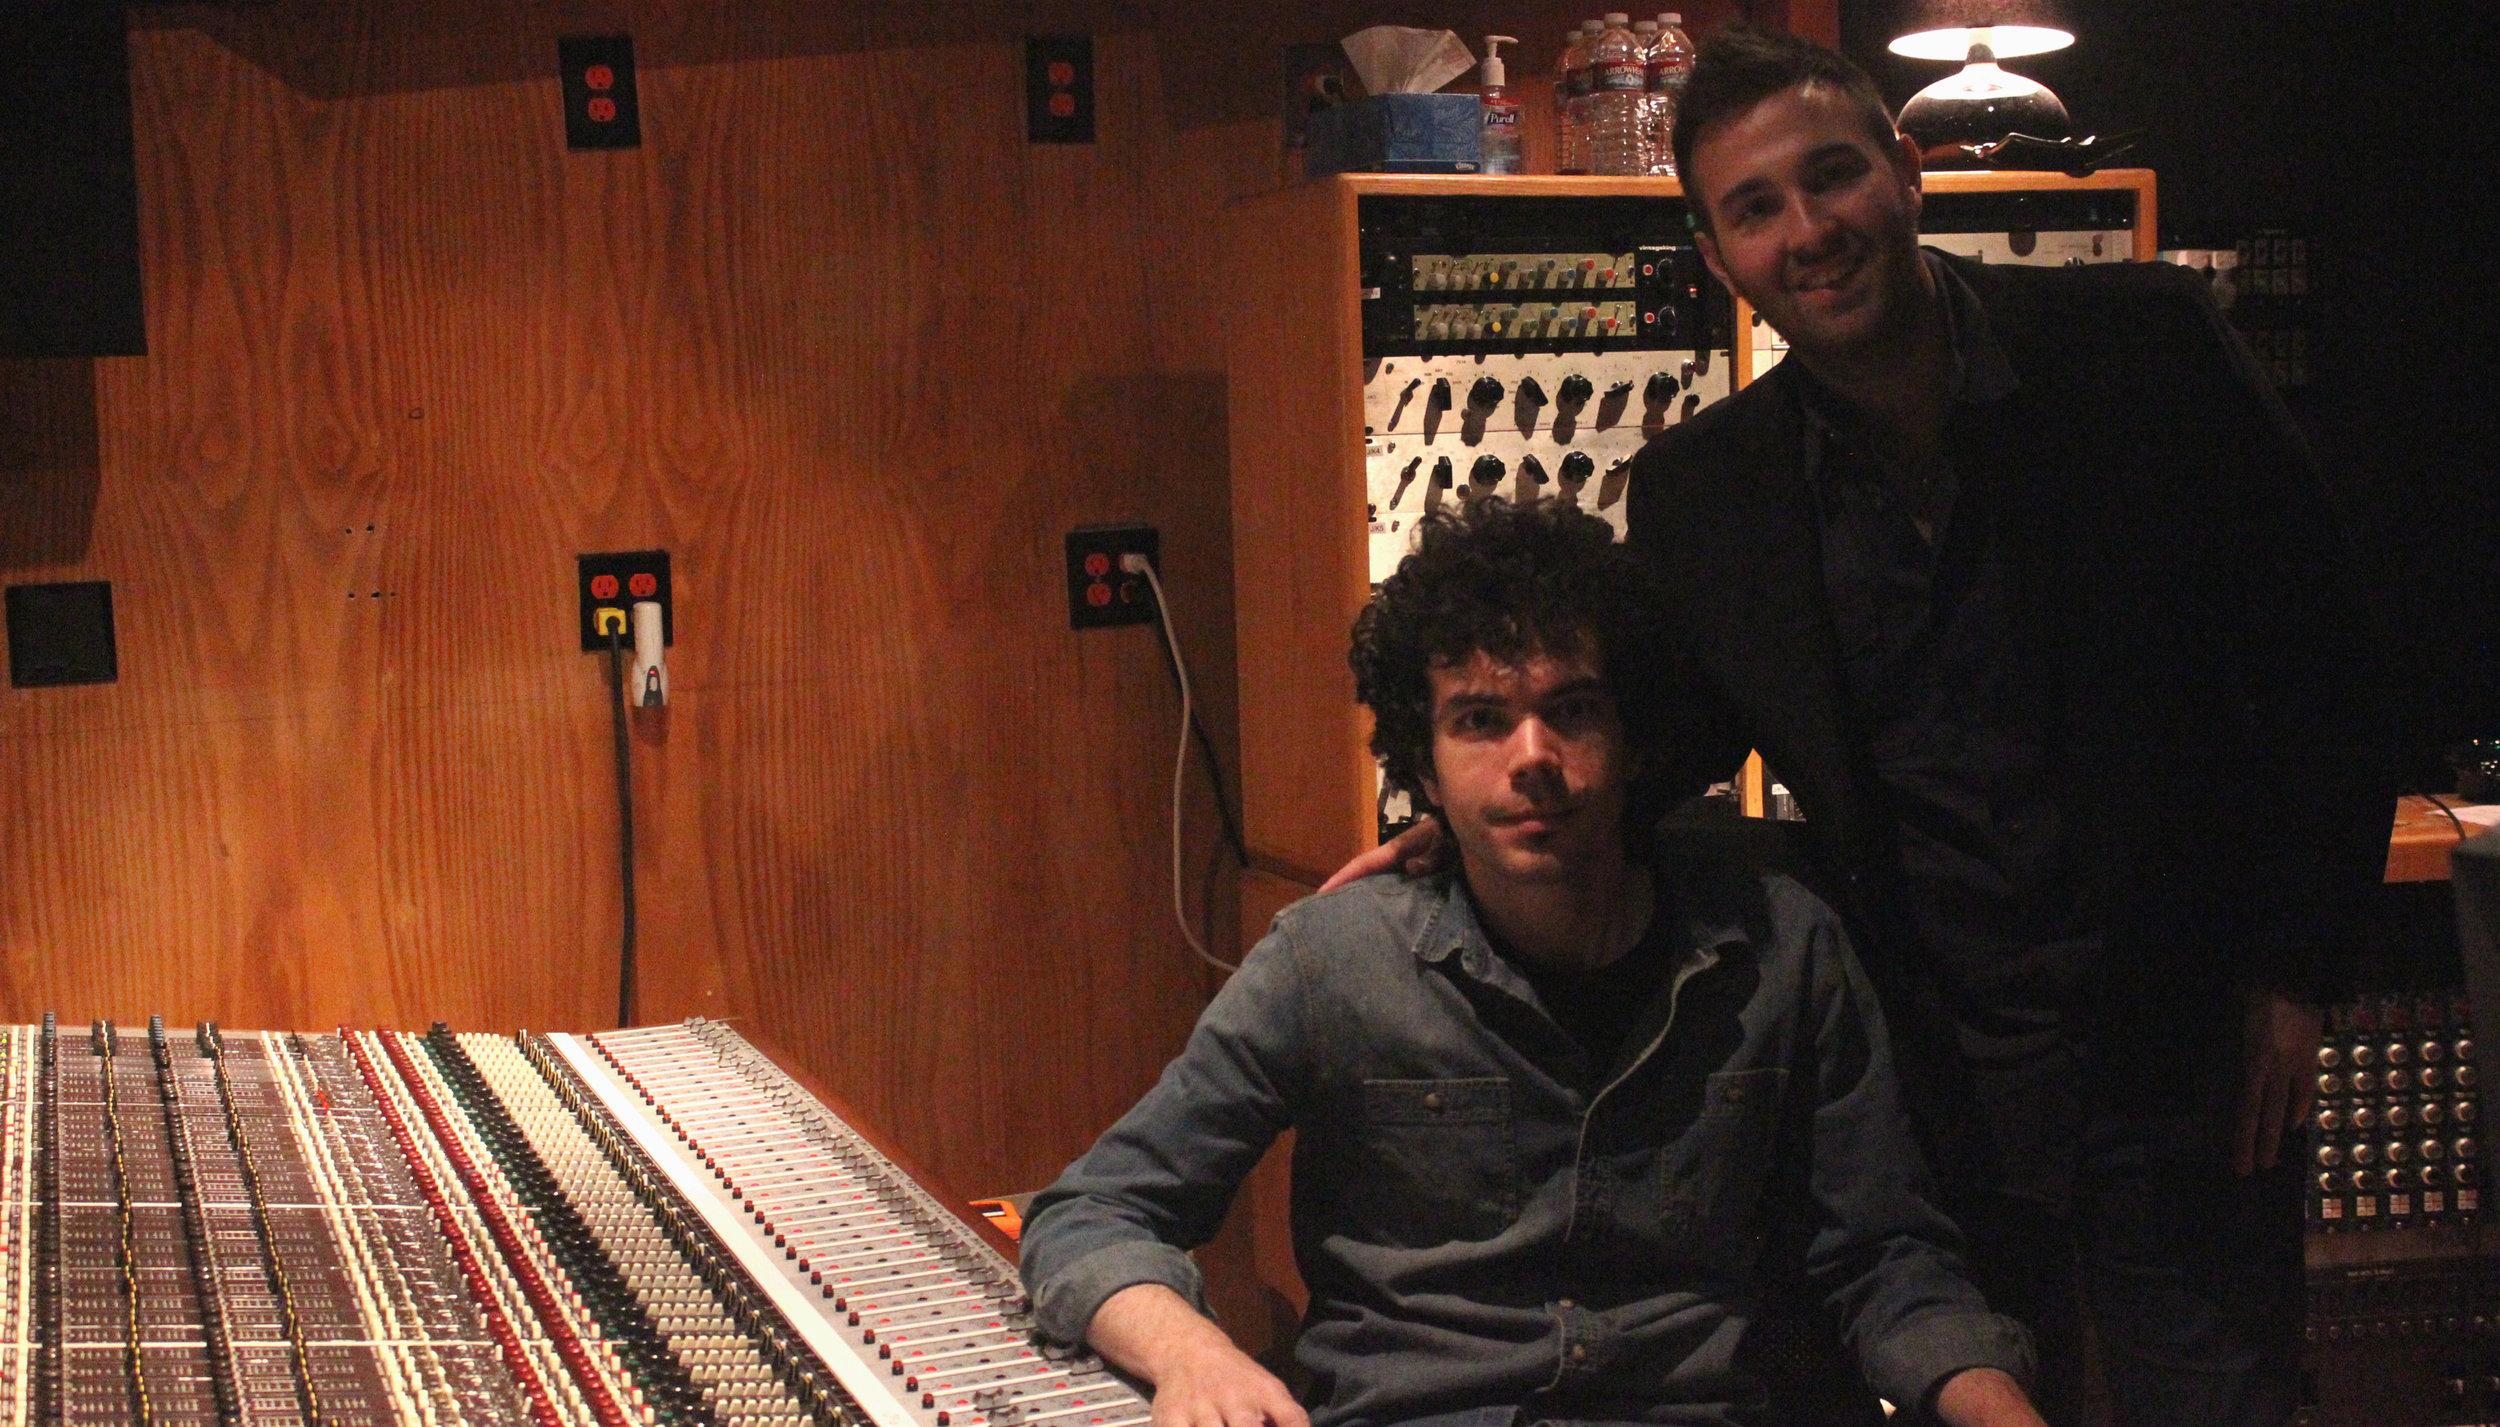 Studio Musician-Guitar w/ Producer Dan Blanck of Blanck Records